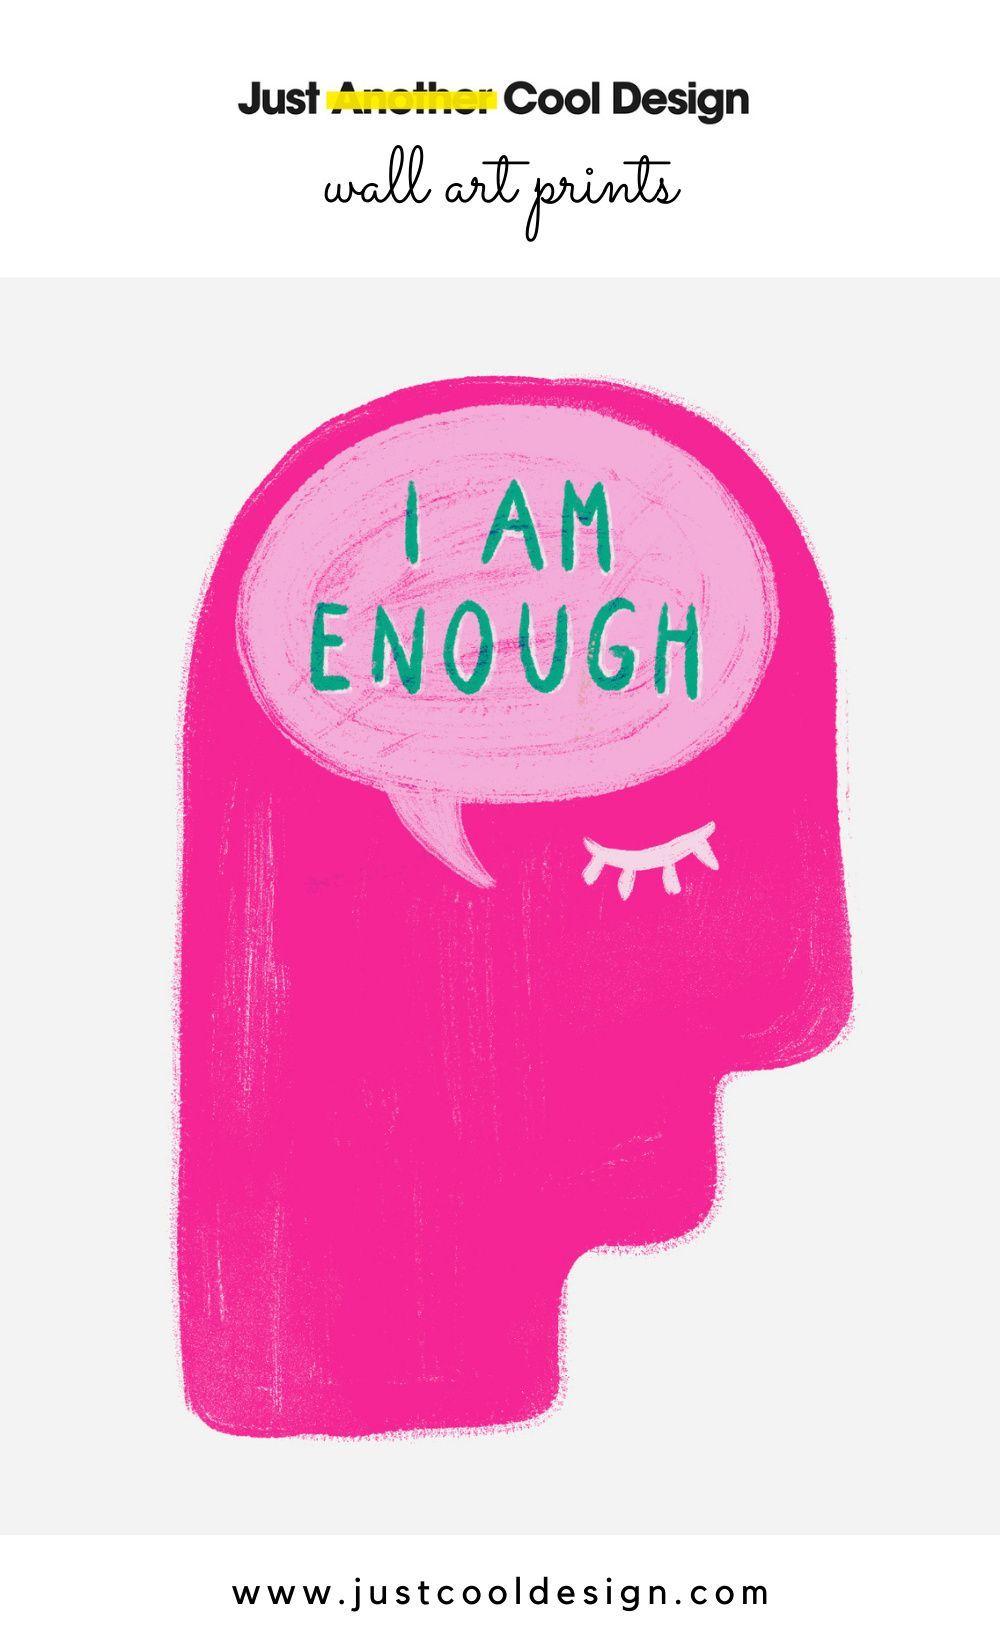 I am enough inspirational positive art painting, self love affirmation illustration wall art prints